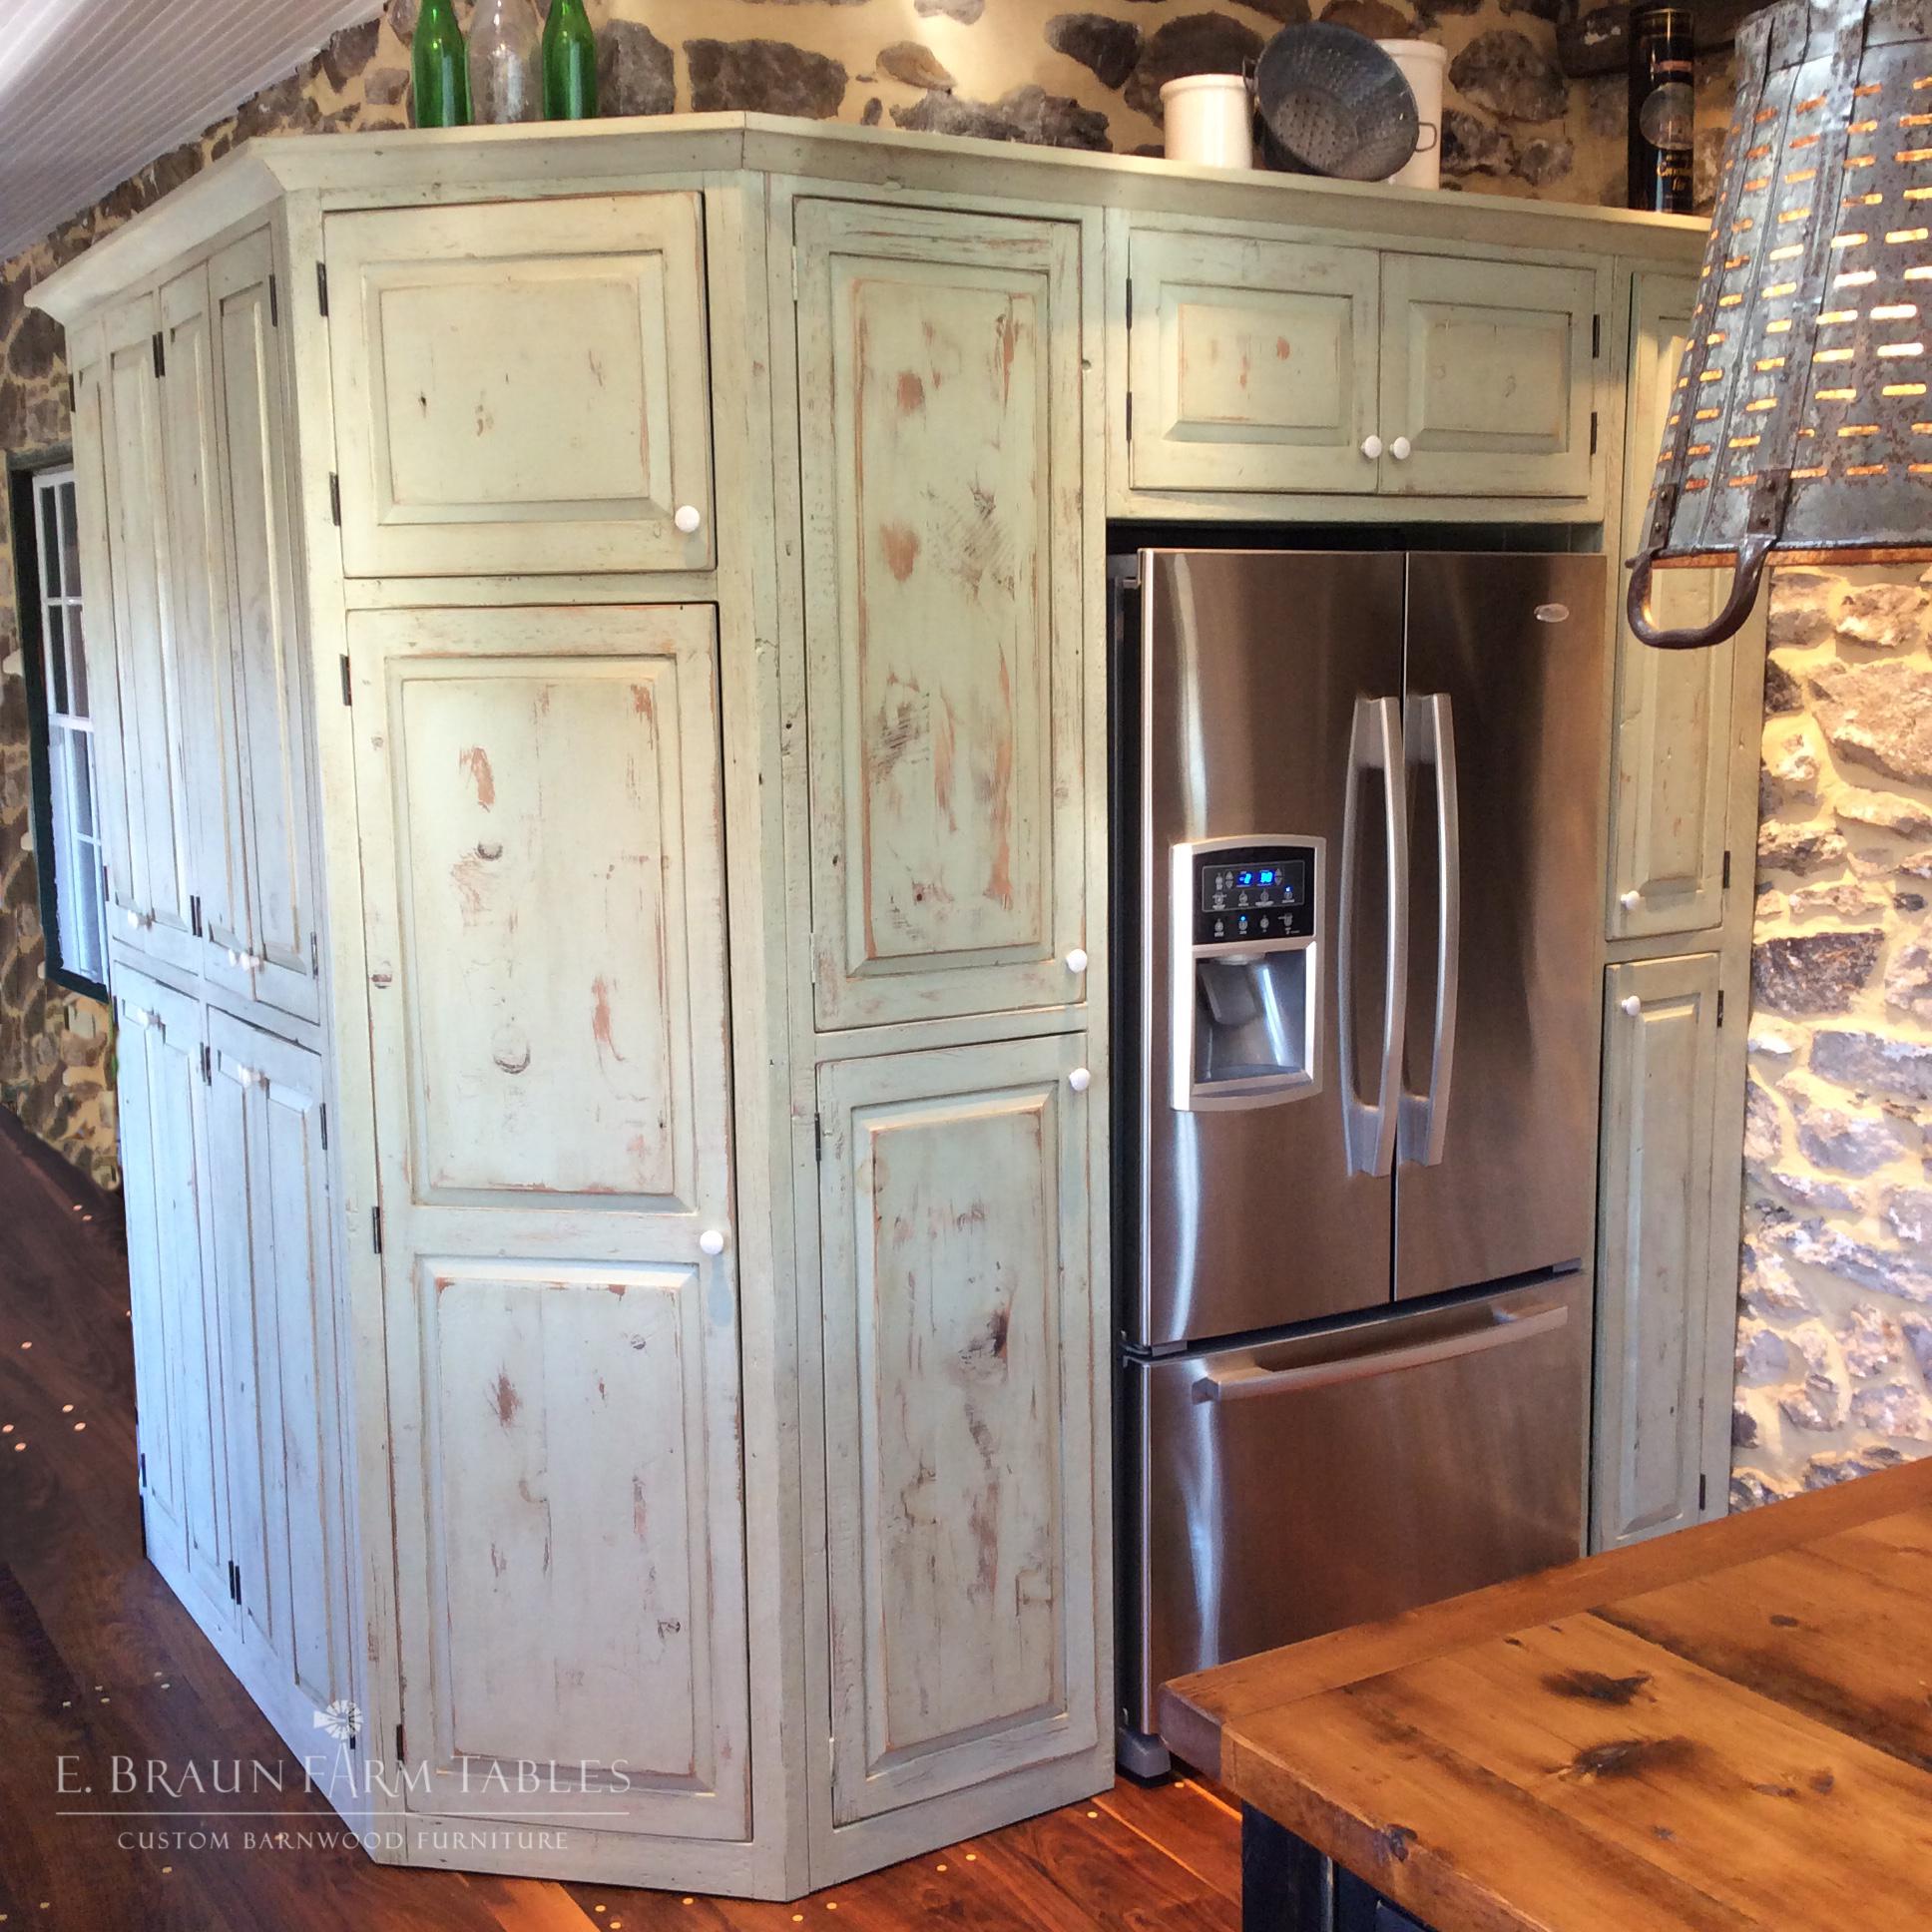 Refrigerator surround cabinetry